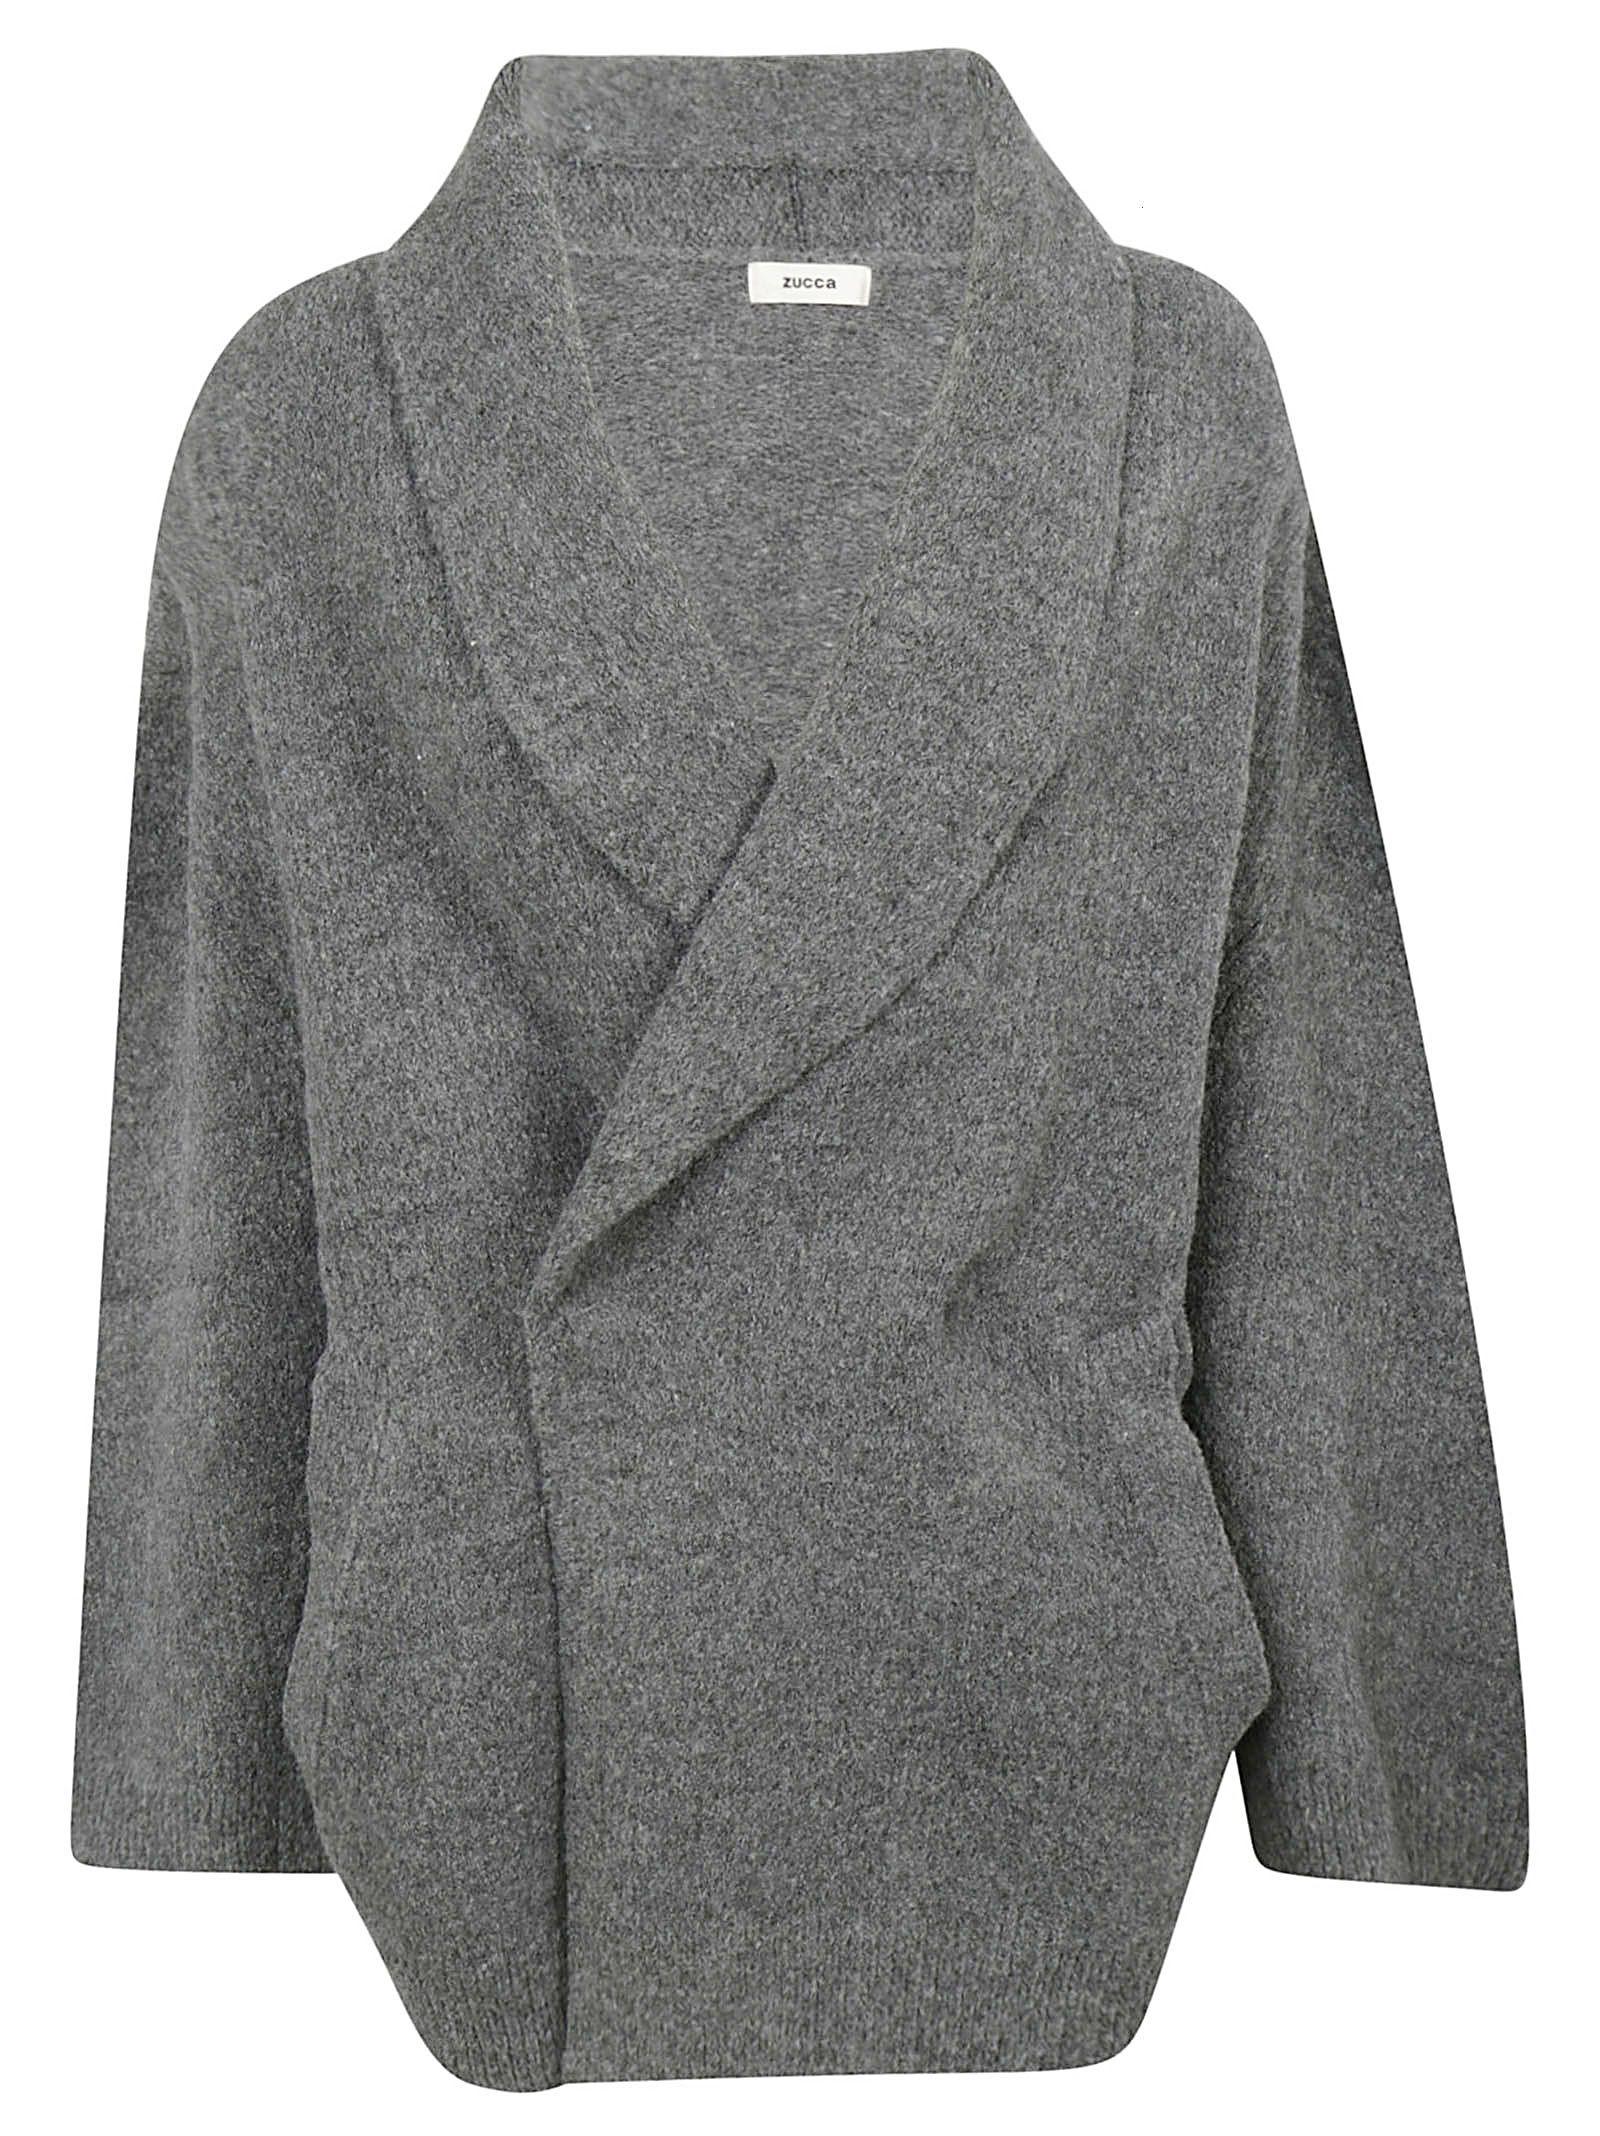 ZUCCA Wrap Style Cardigan in Grey